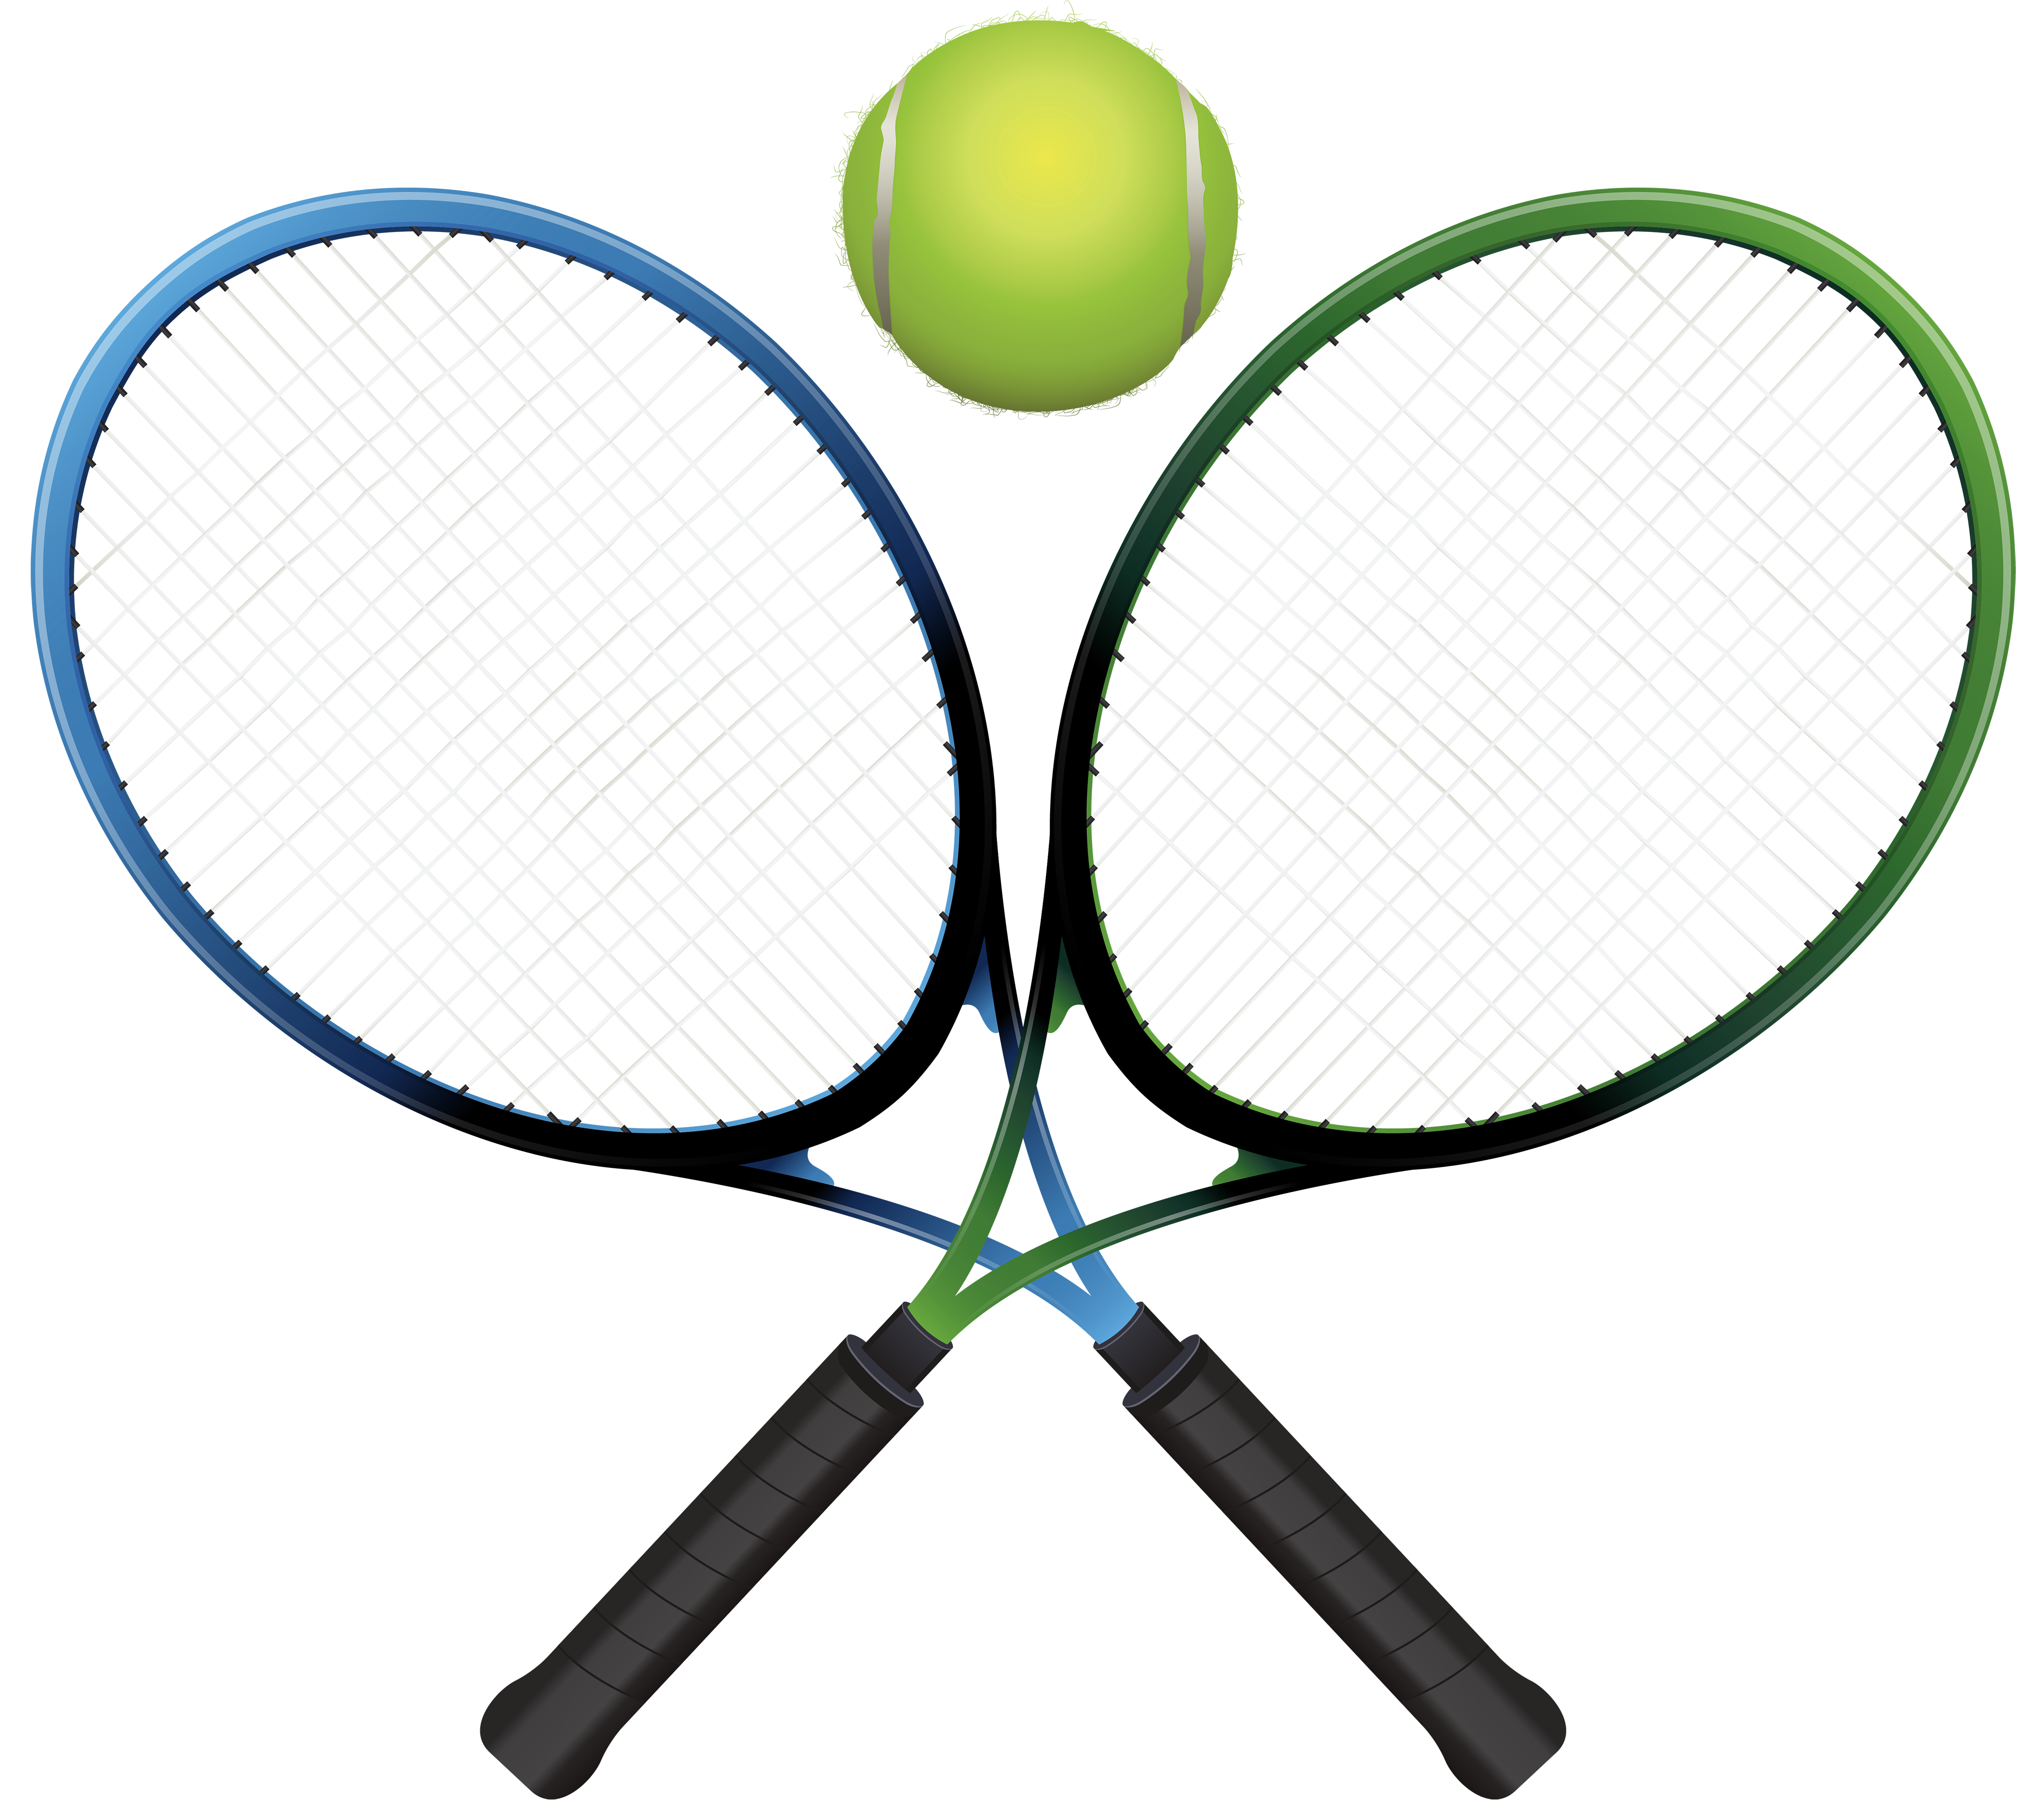 tennis clip art crab clipart images clipartw 2 - Tennis PNG